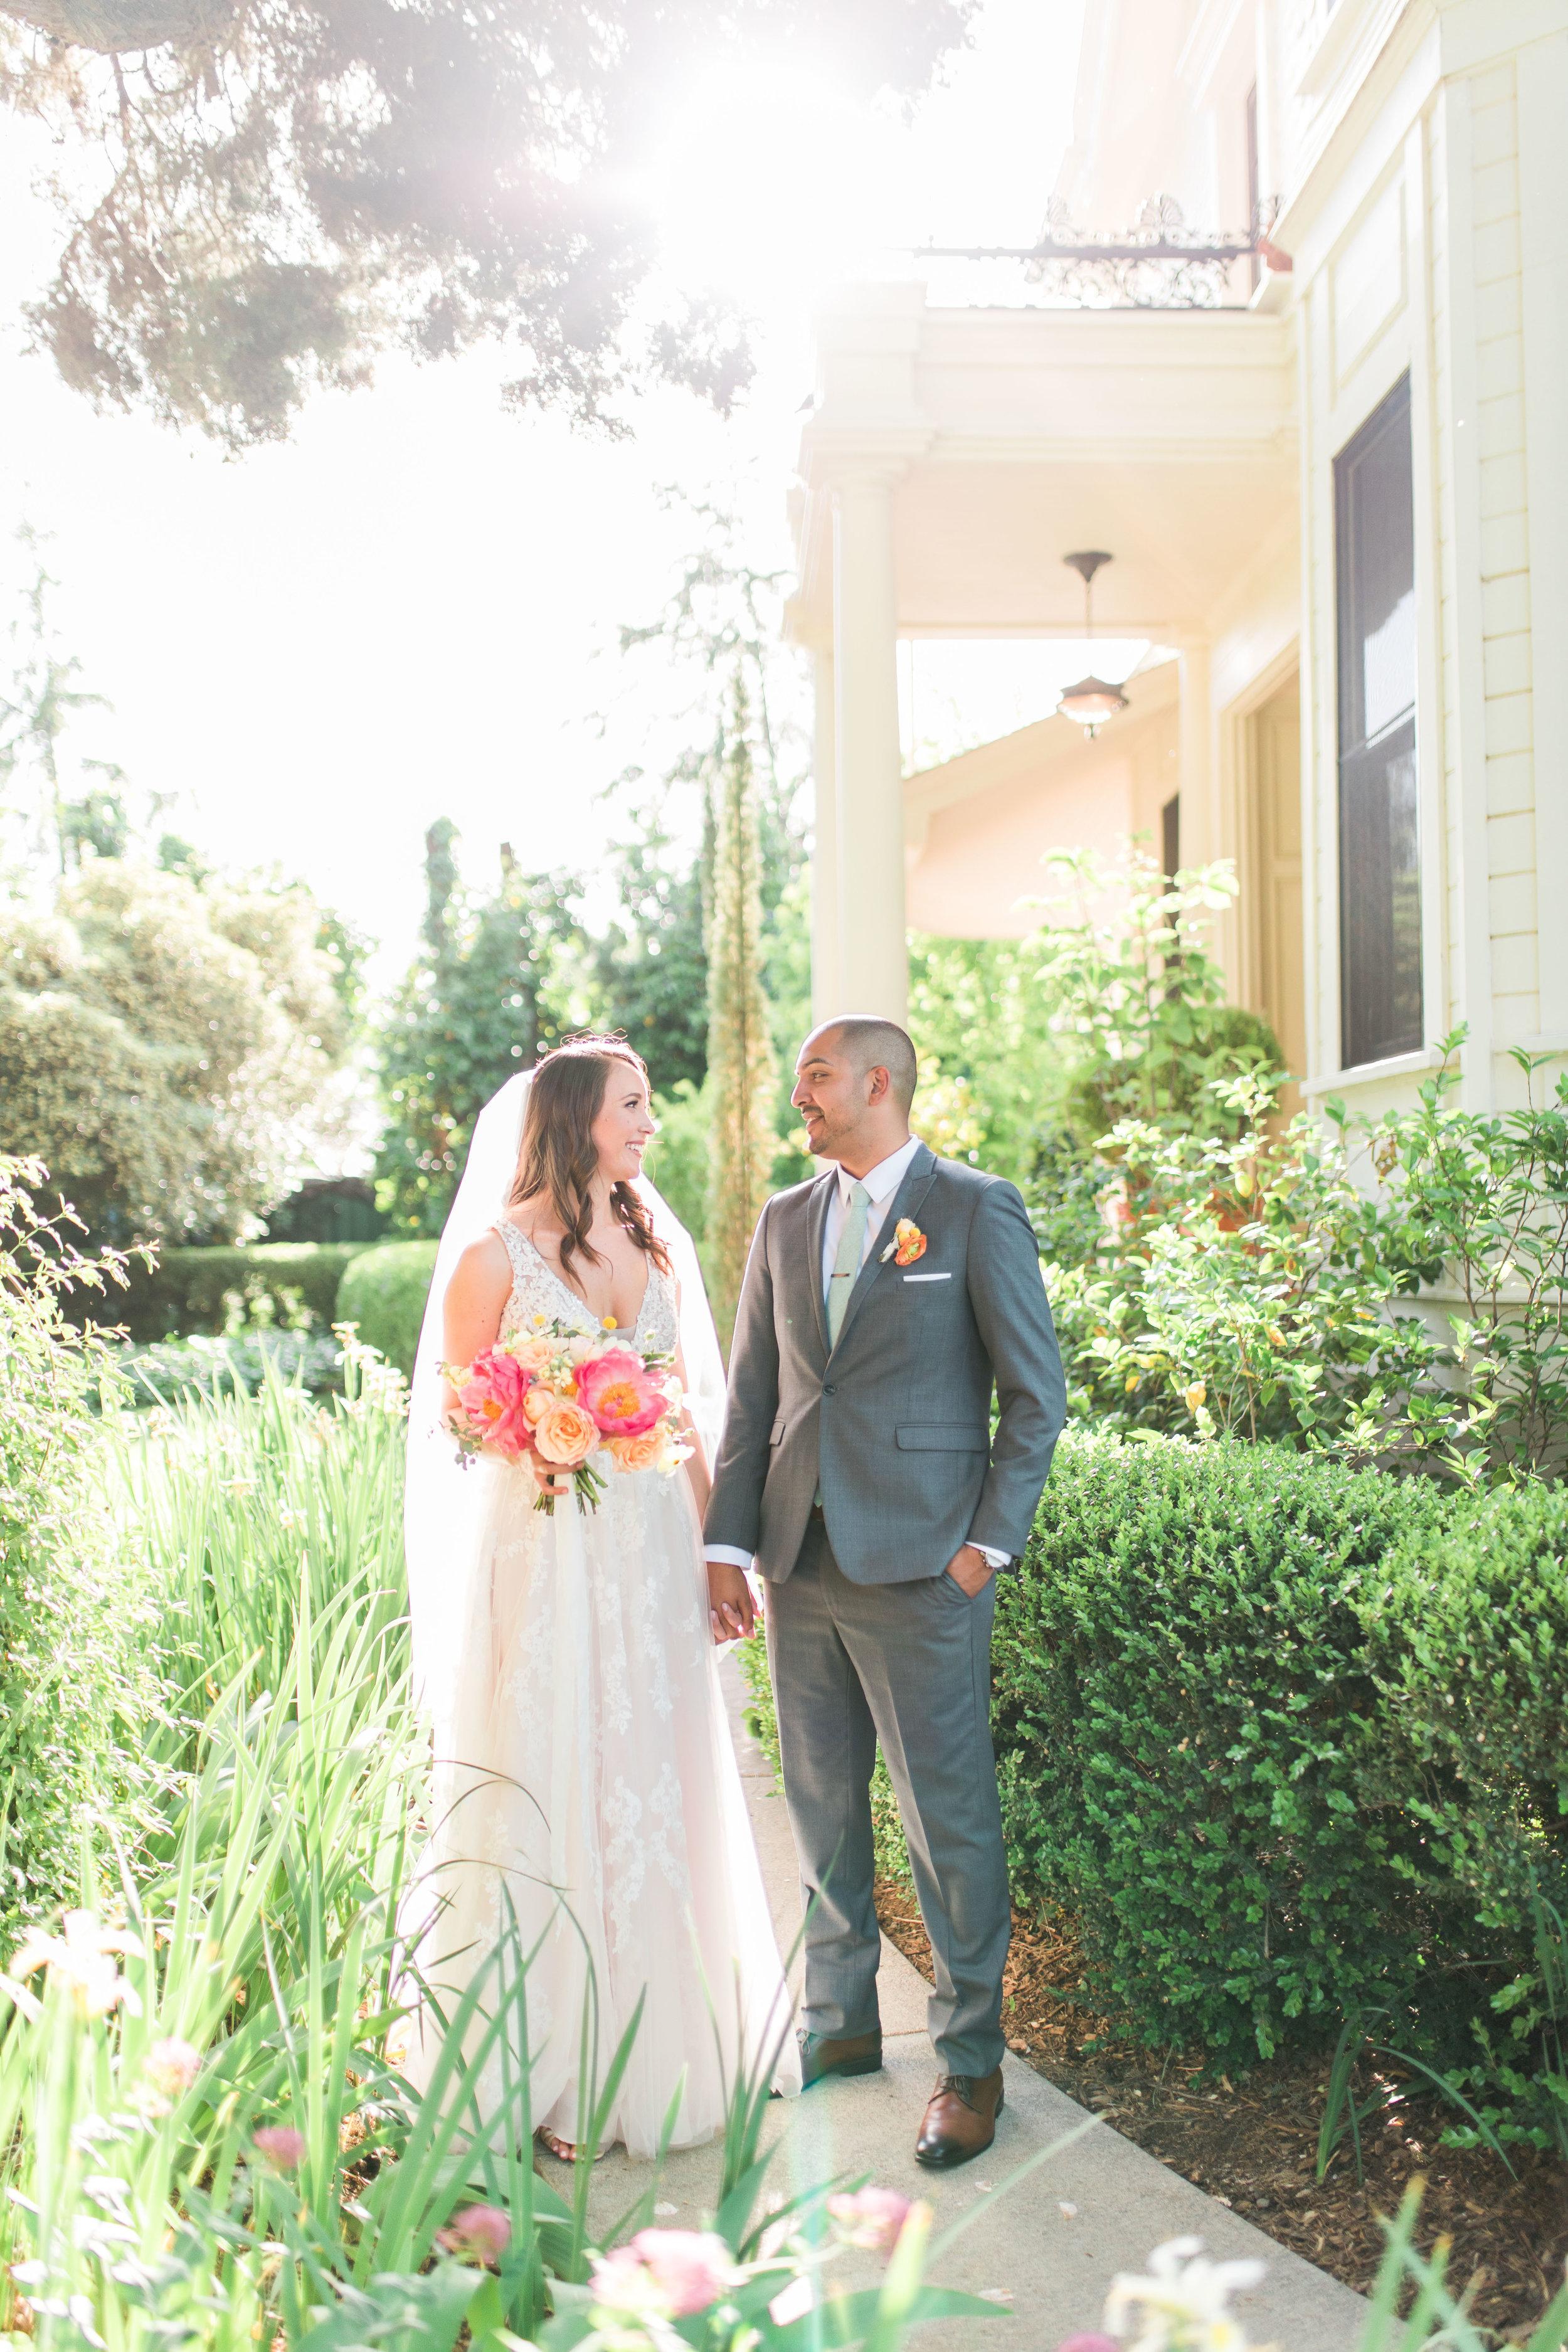 Tess-Jesse-Wedding-SP-by-JBJ-Pictures-14.jpg